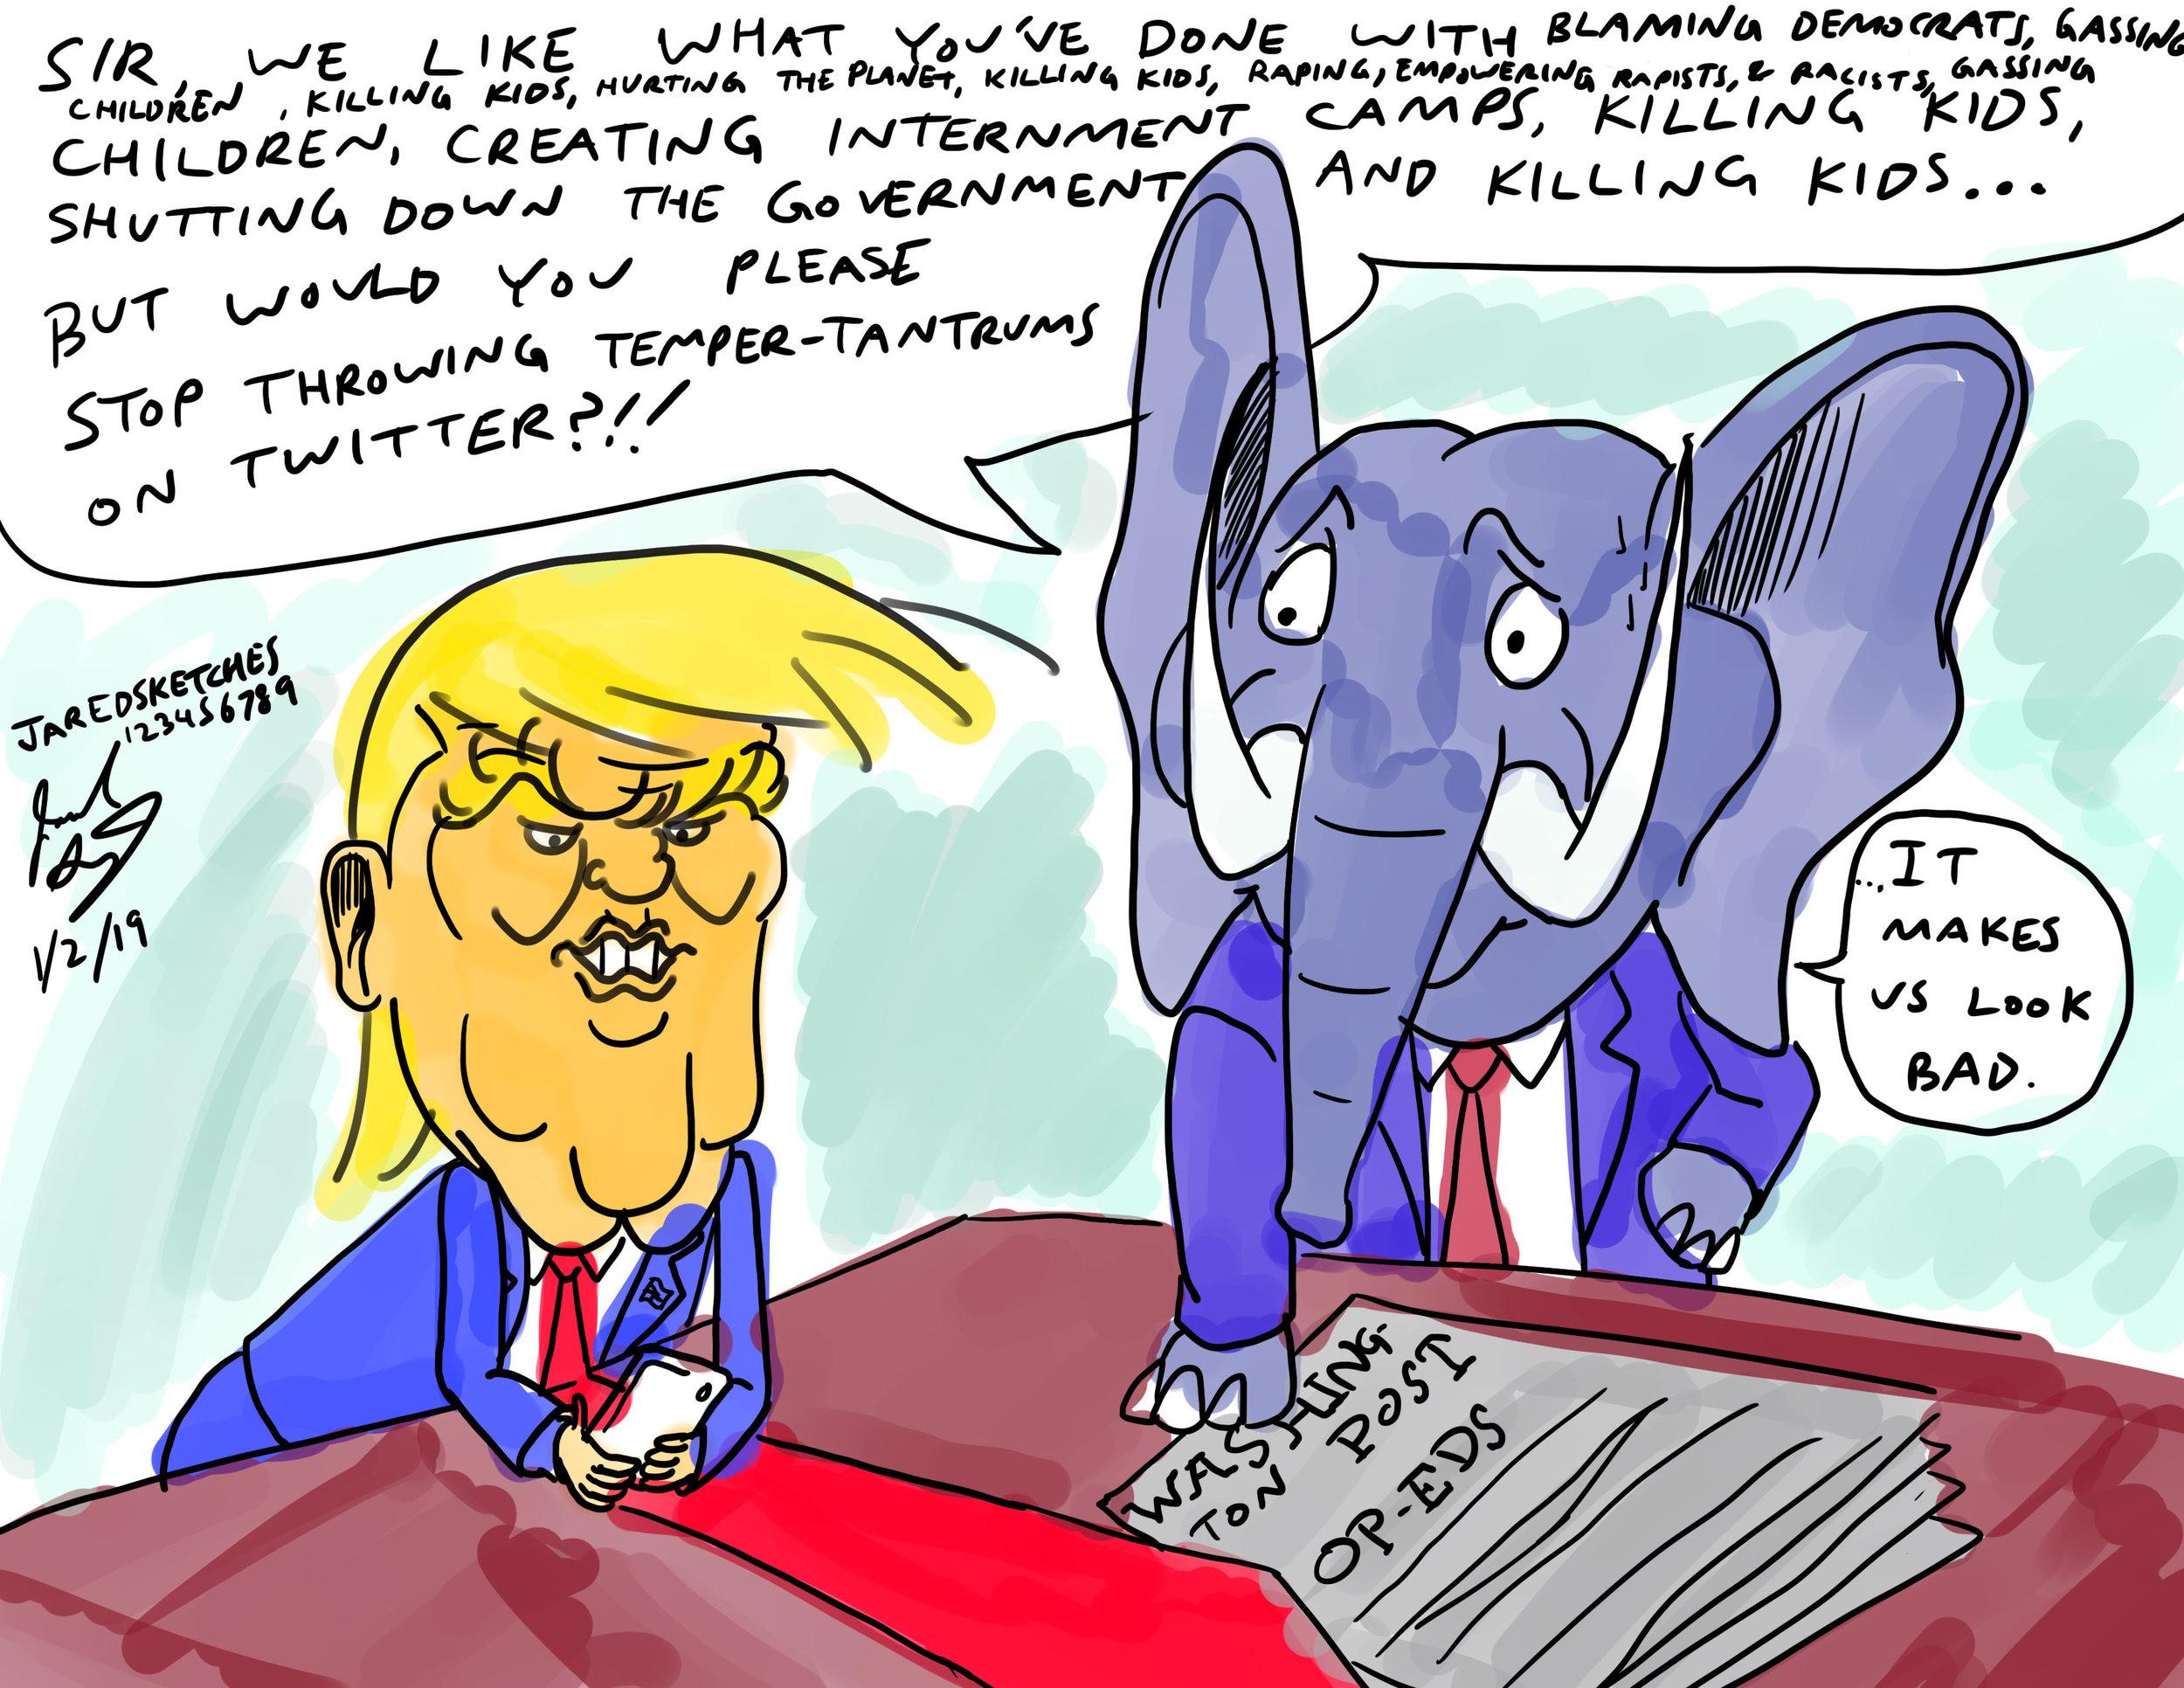 Washington Post Op-Eds